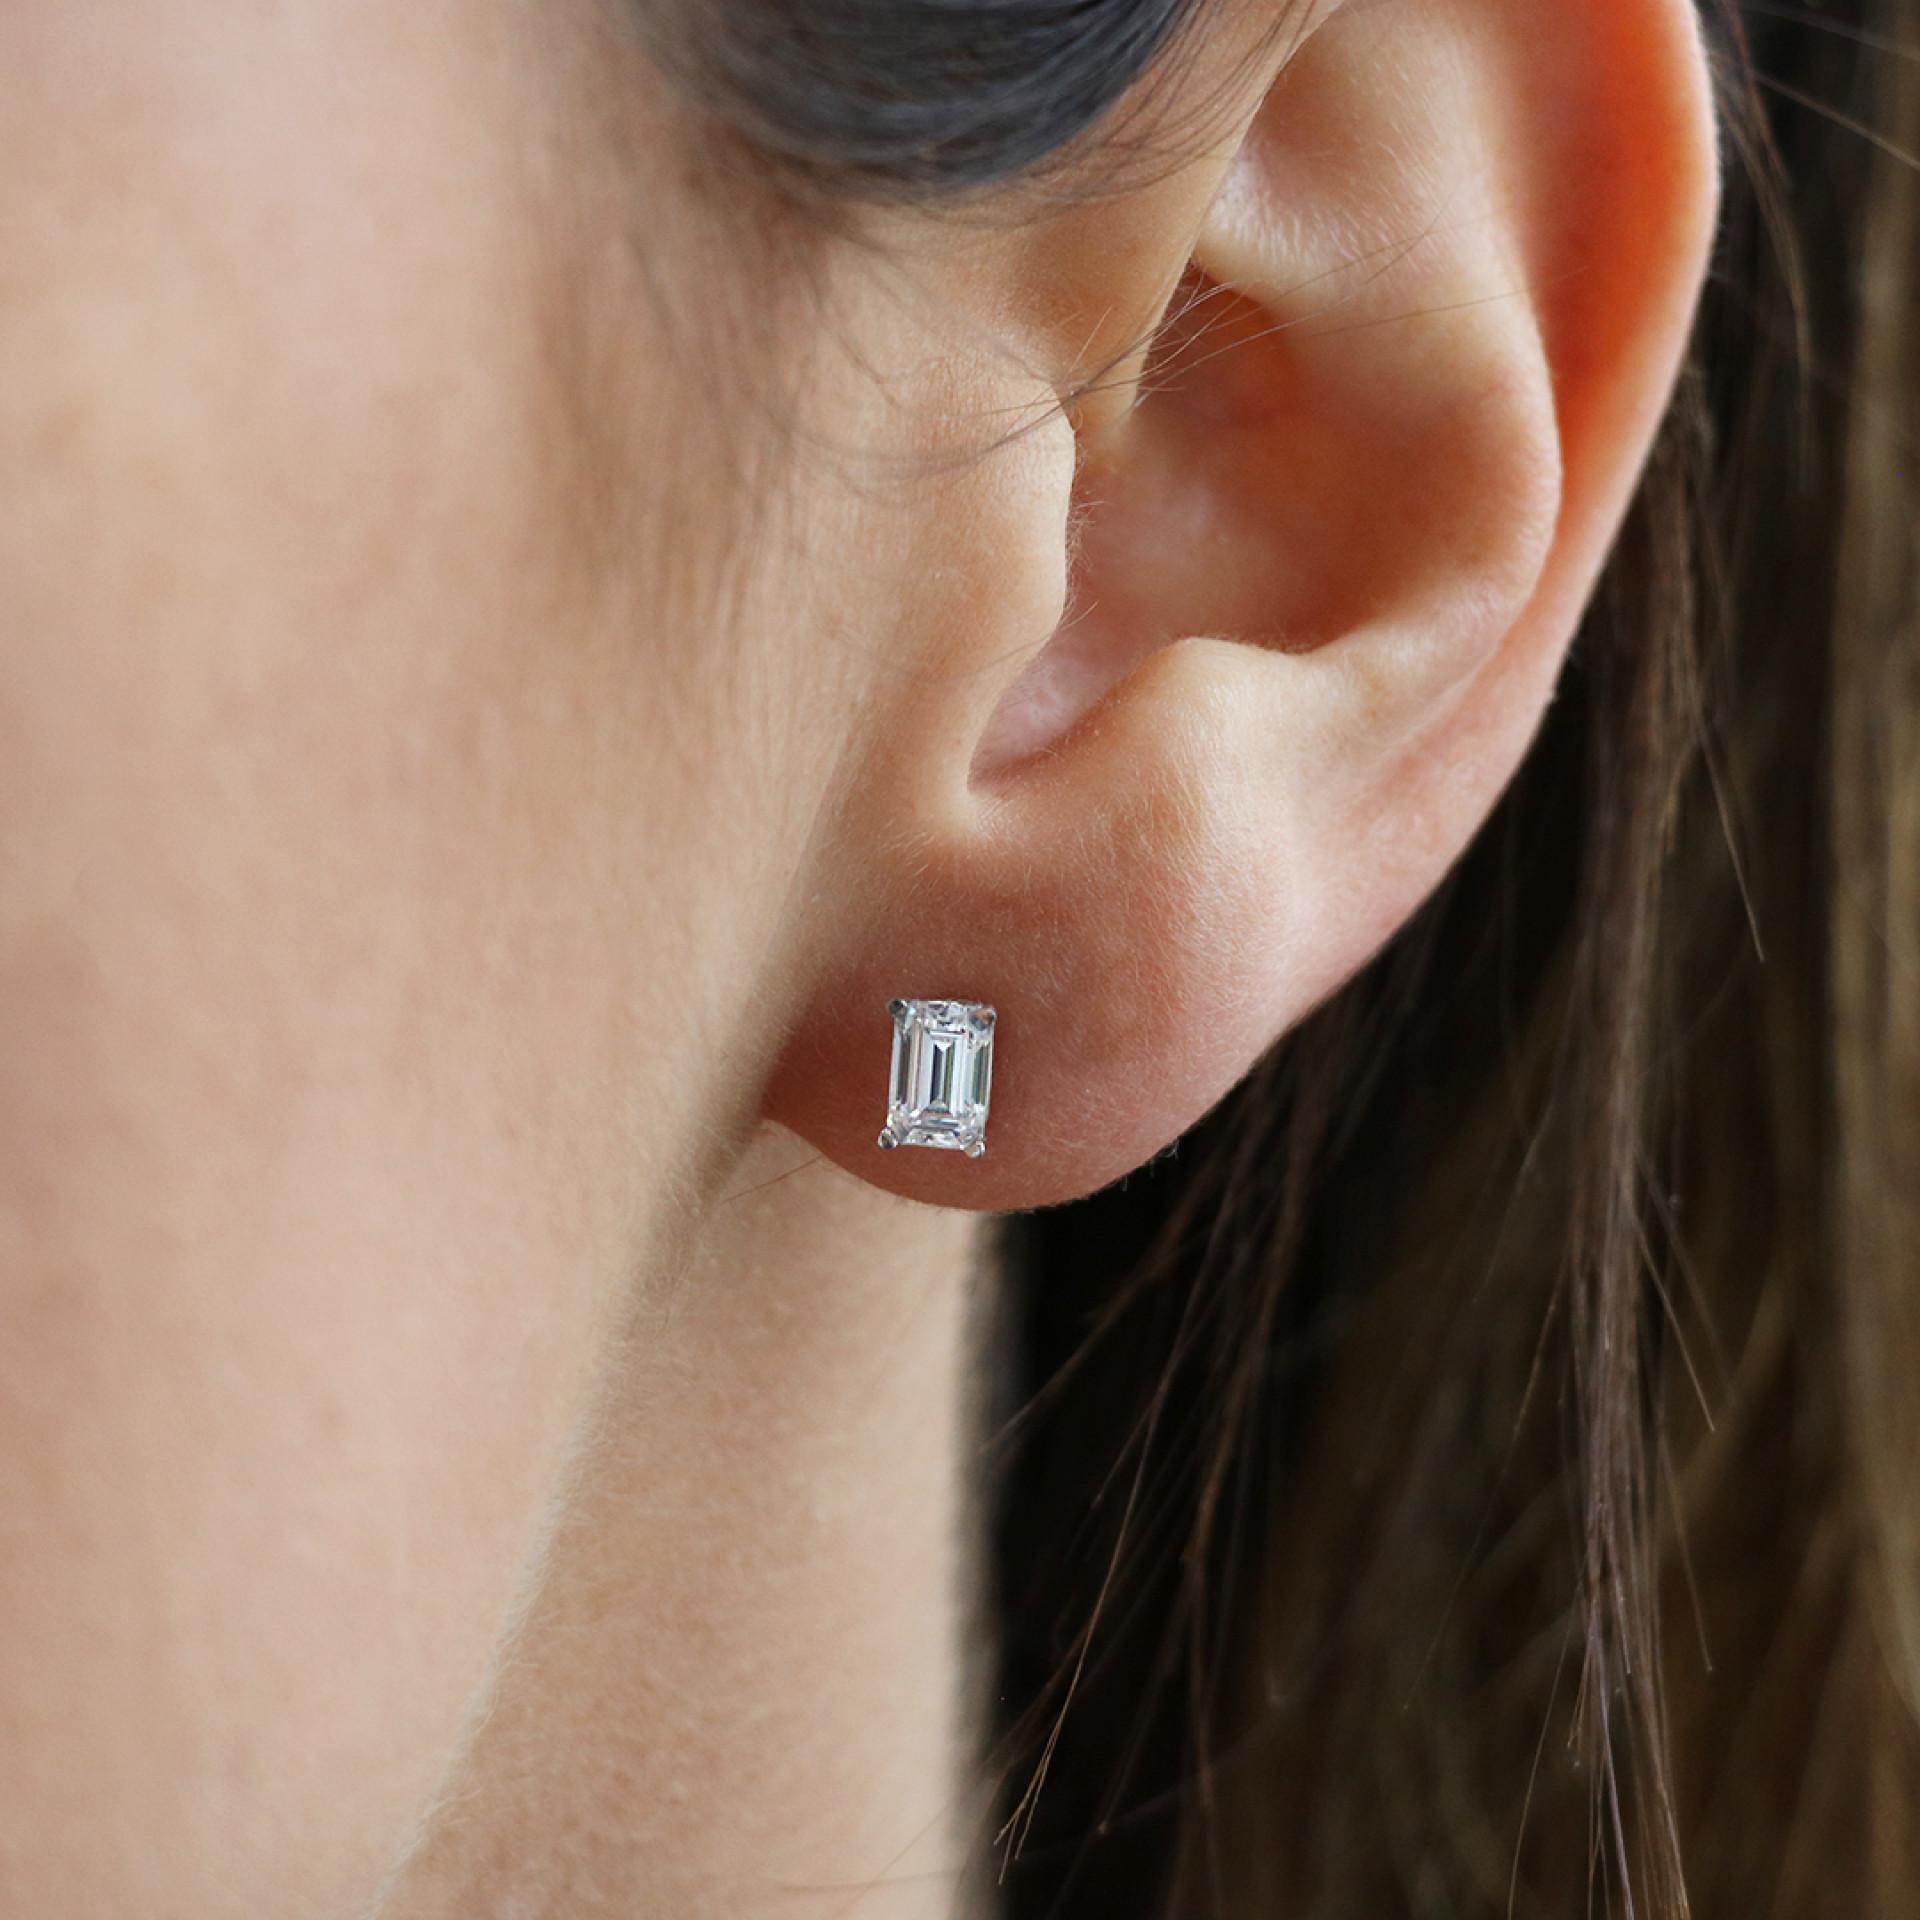 0.66 Carat Emerald Cut Stud Earrings Basket Set - 14k Yellow Gold. 1 c011b1da8